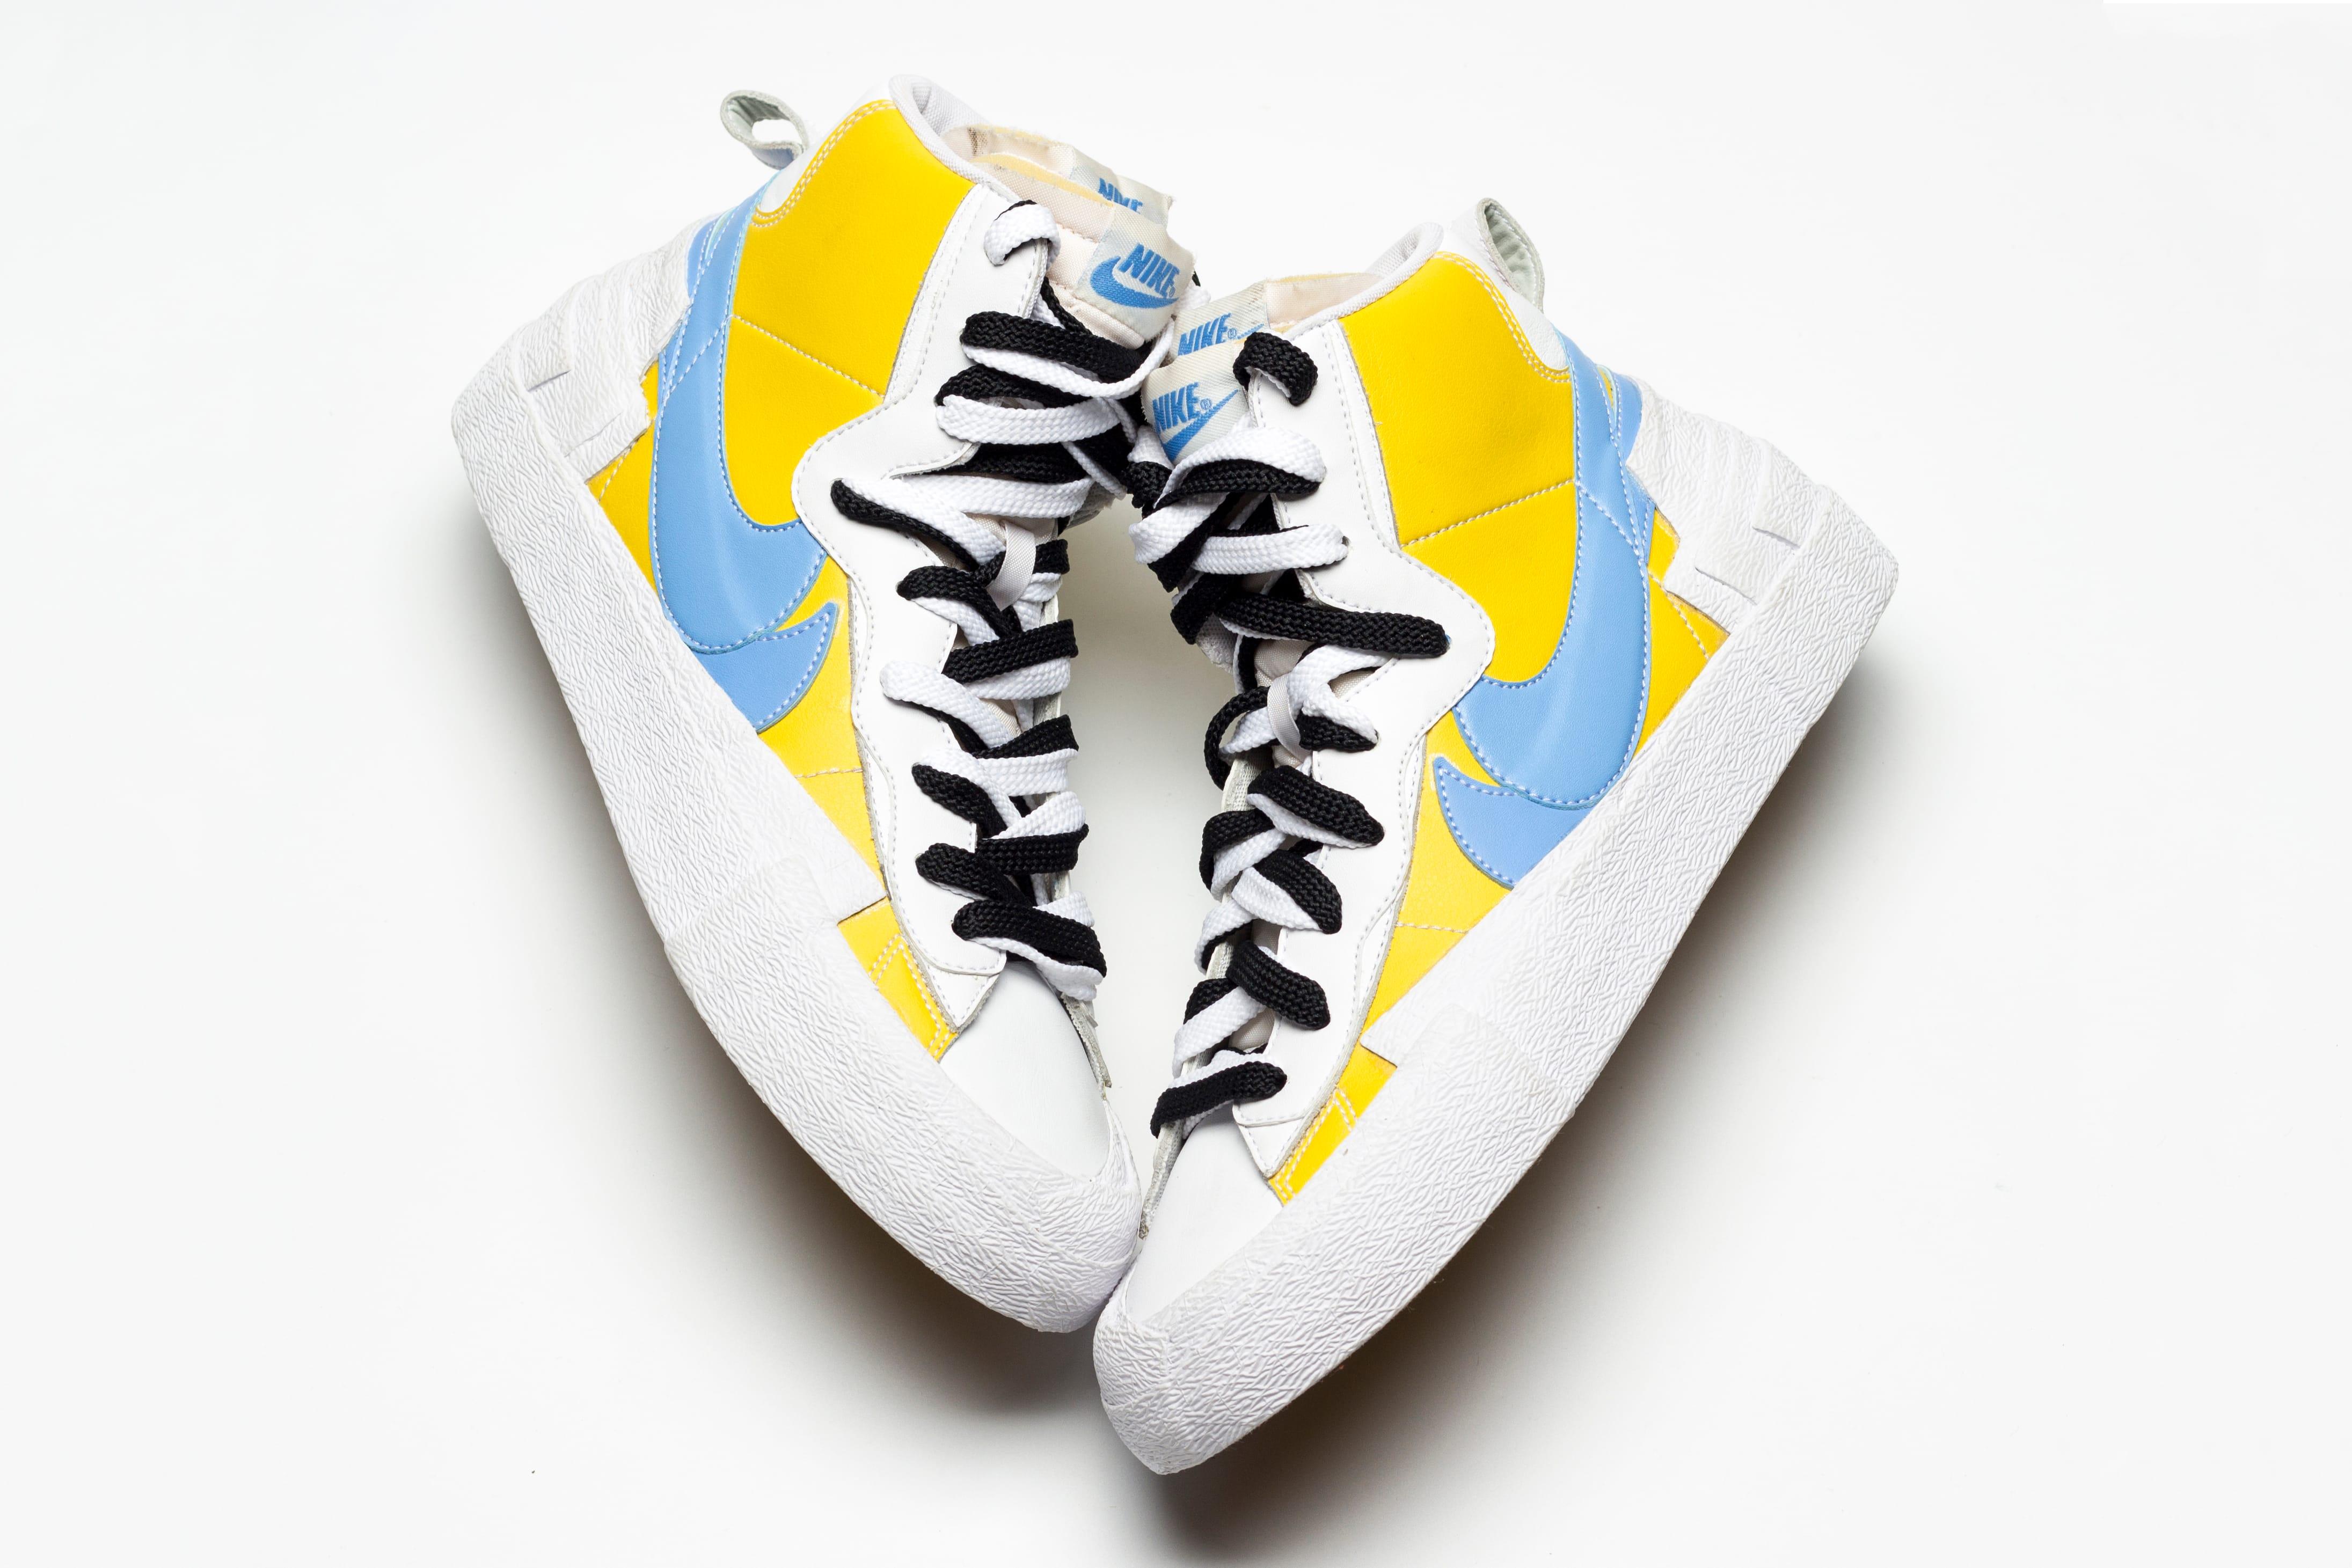 Nike Confirms sacai x Blazer Yellow